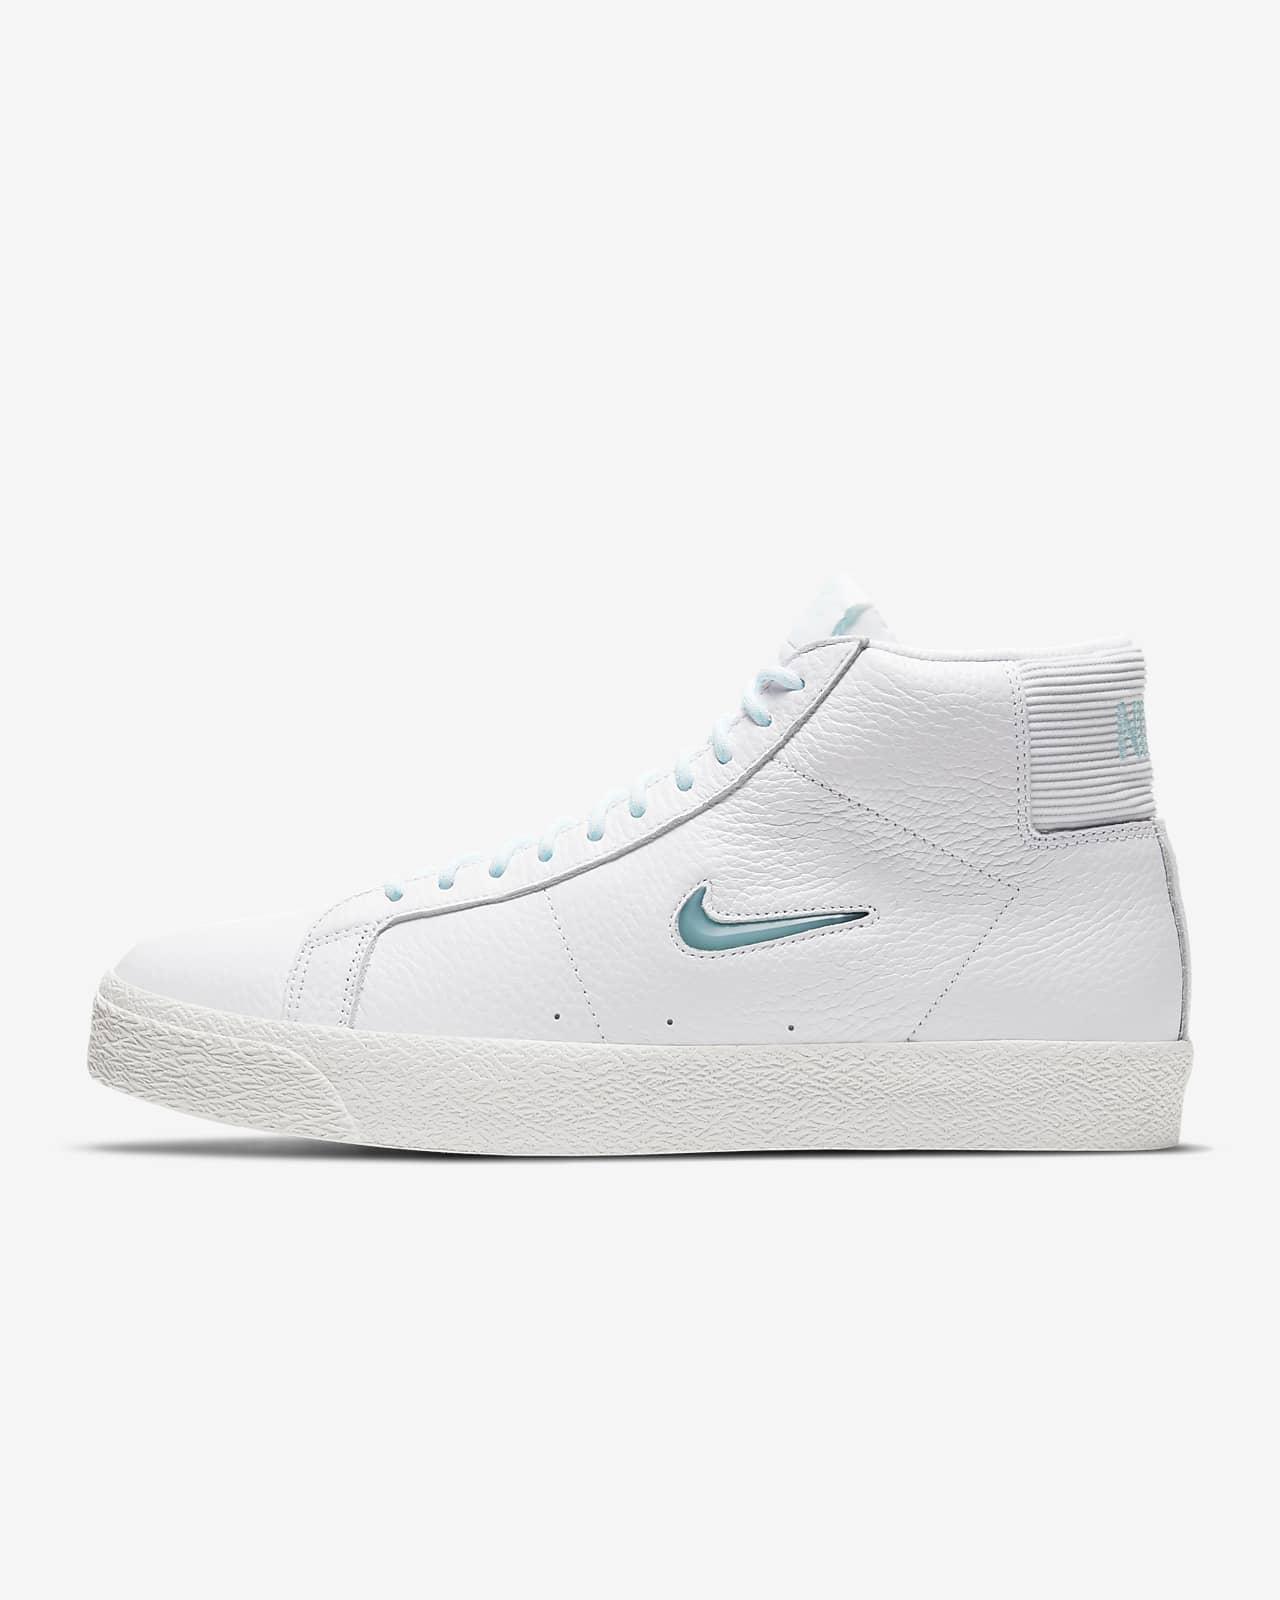 Nike SB Zoom Blazer Mid Premium Skateboardschuh